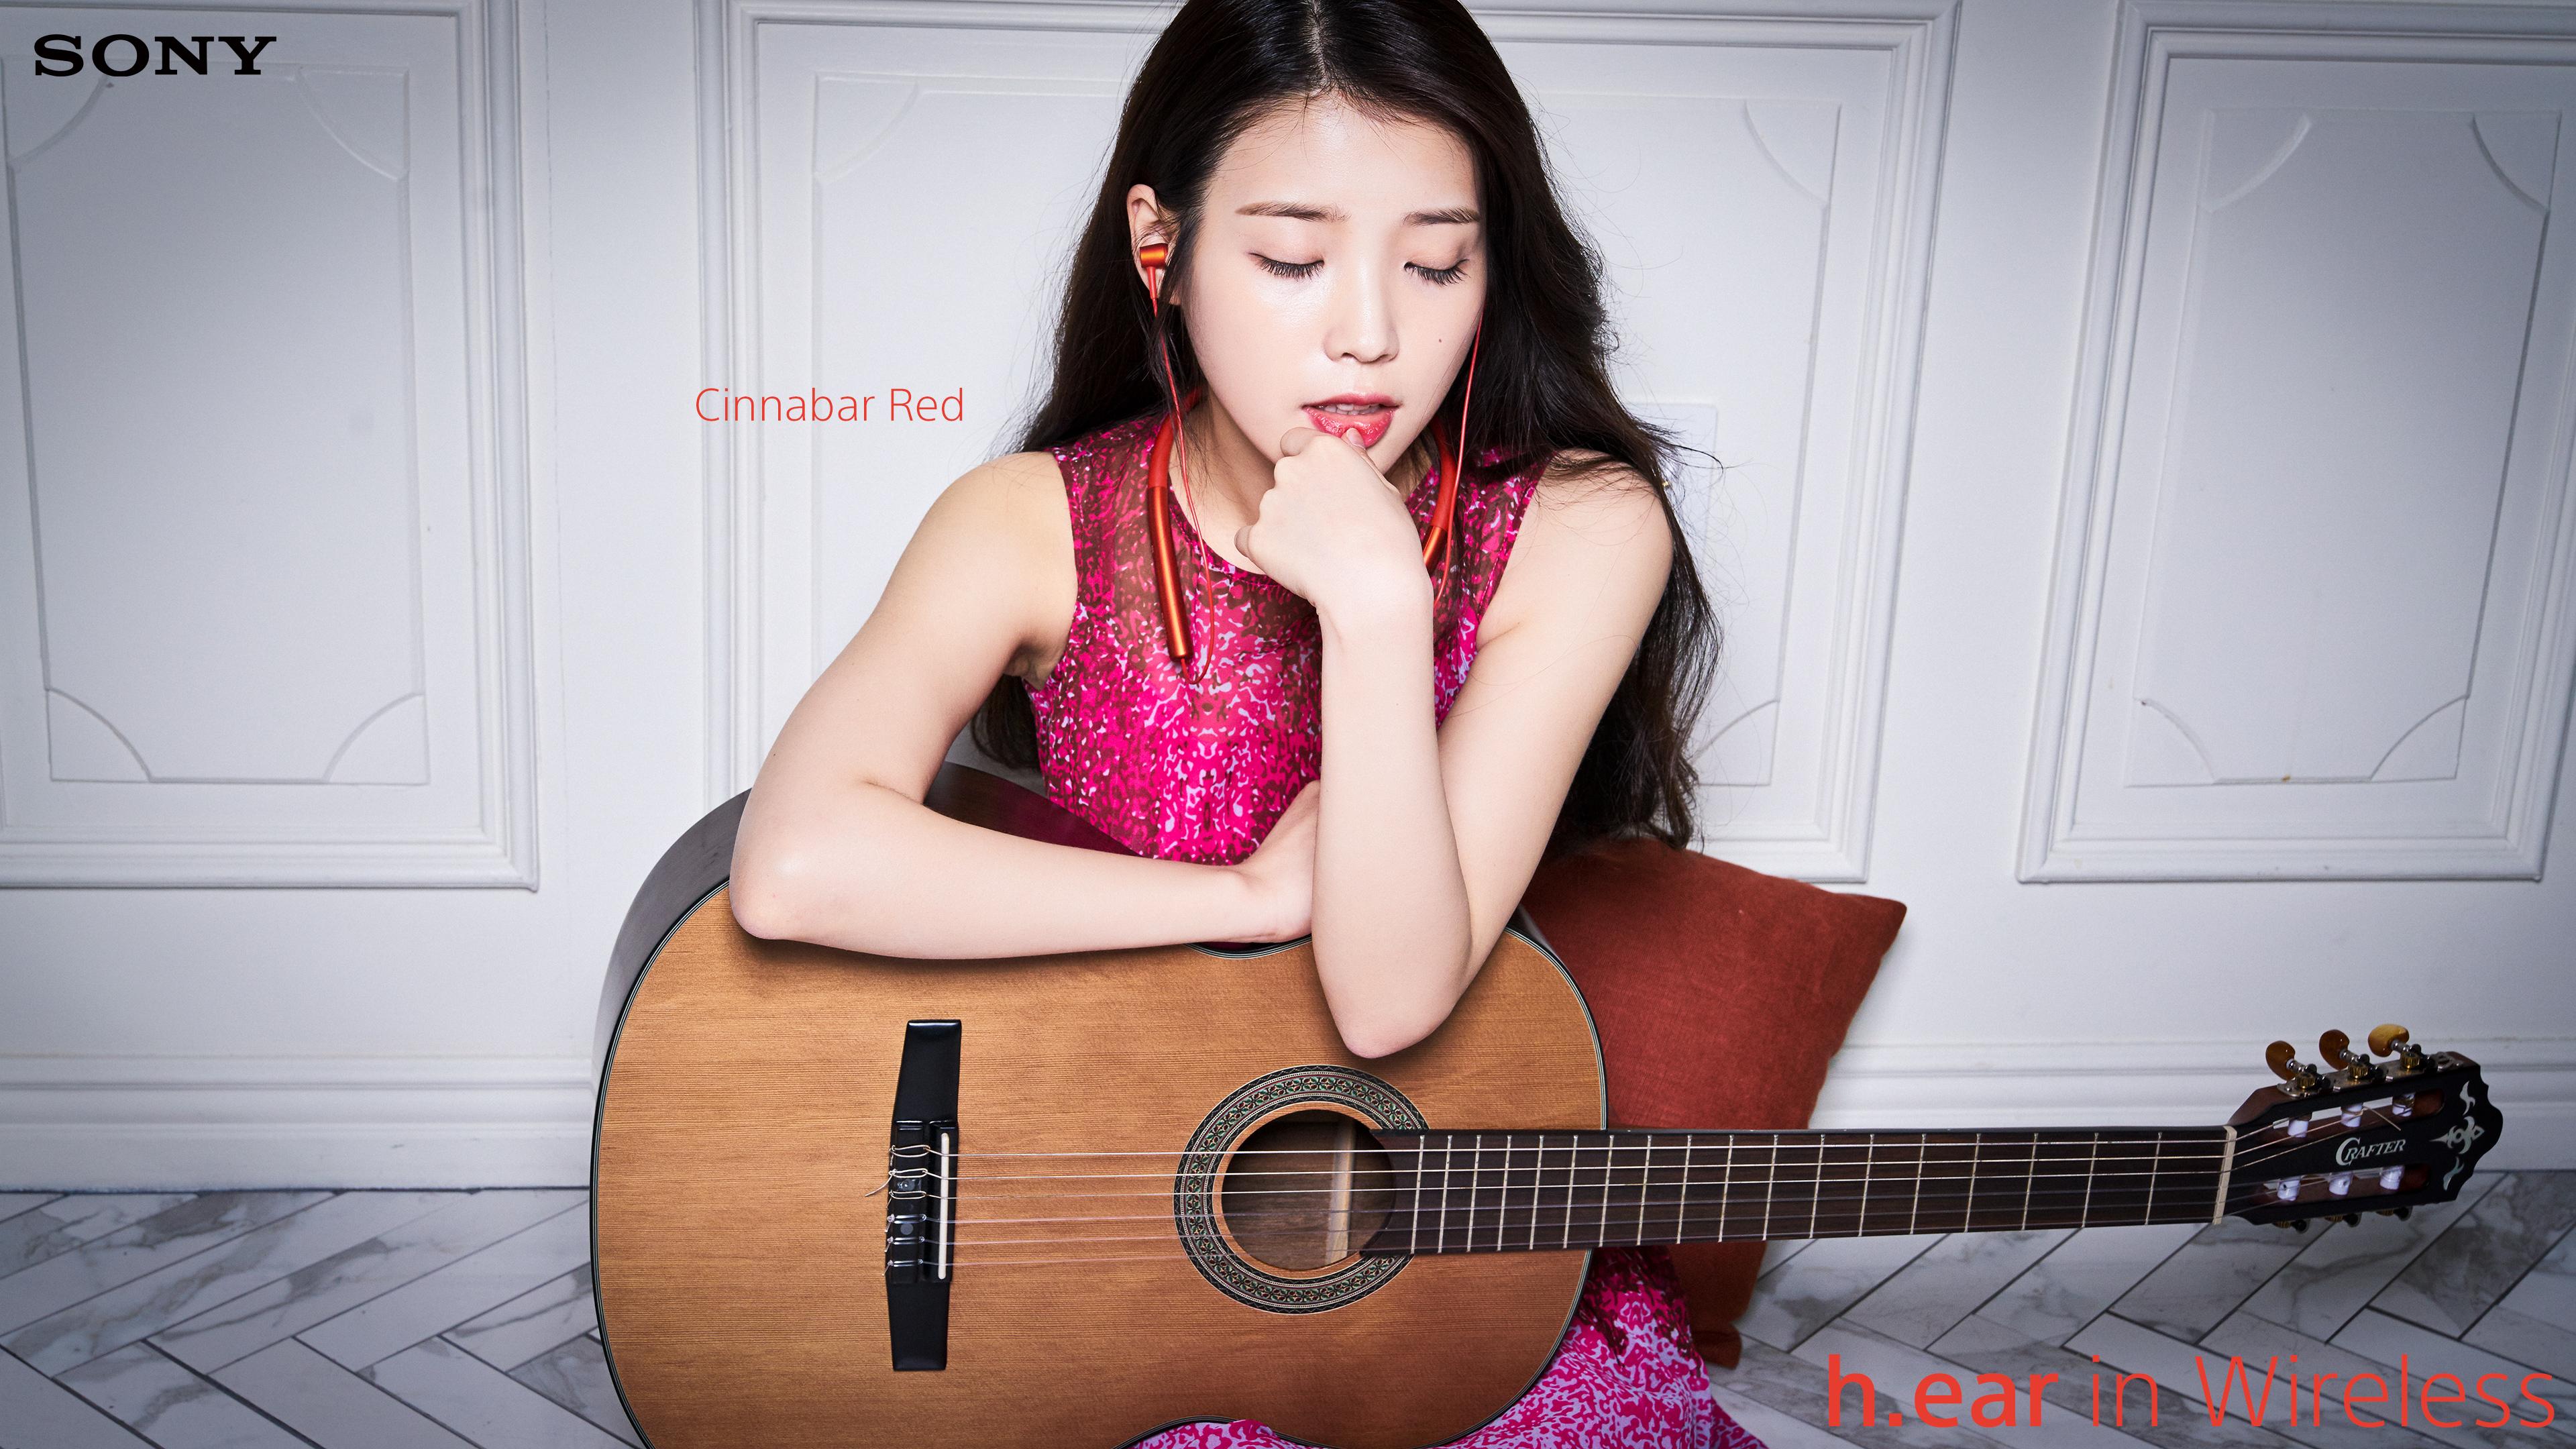 160419 IU for Sony Korea 시나바 레드 Cinnabar Red